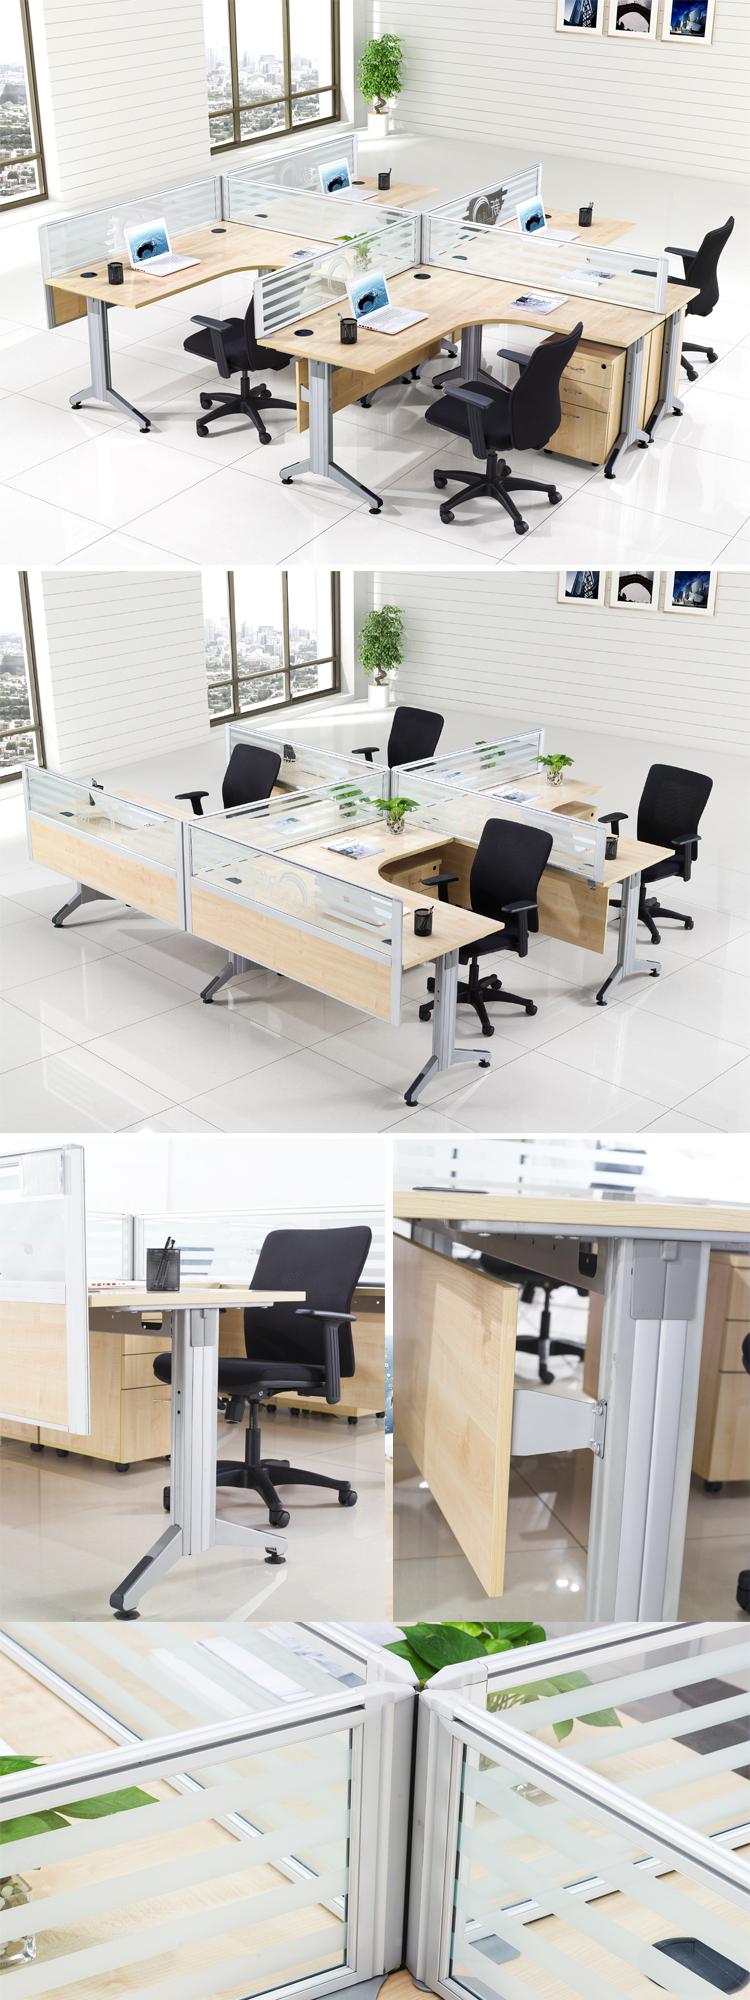 China Modernes Design Holz Modulare Büromöbel/büro Workstation ...